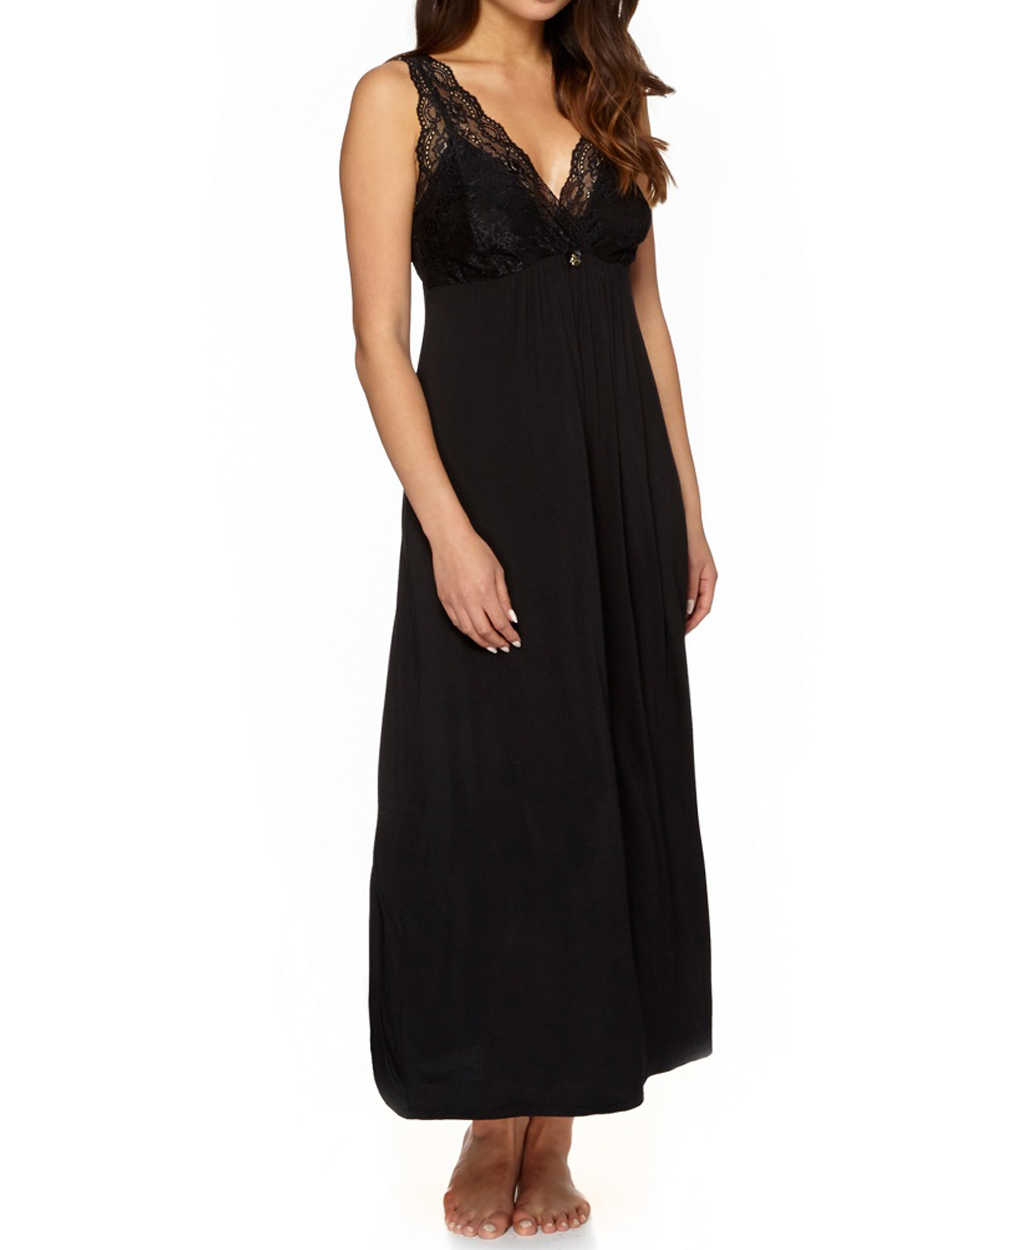 b9498953d Debenhams - - D3benhams BLACK Delicate Lace Long Nightdress - Size 8 ...